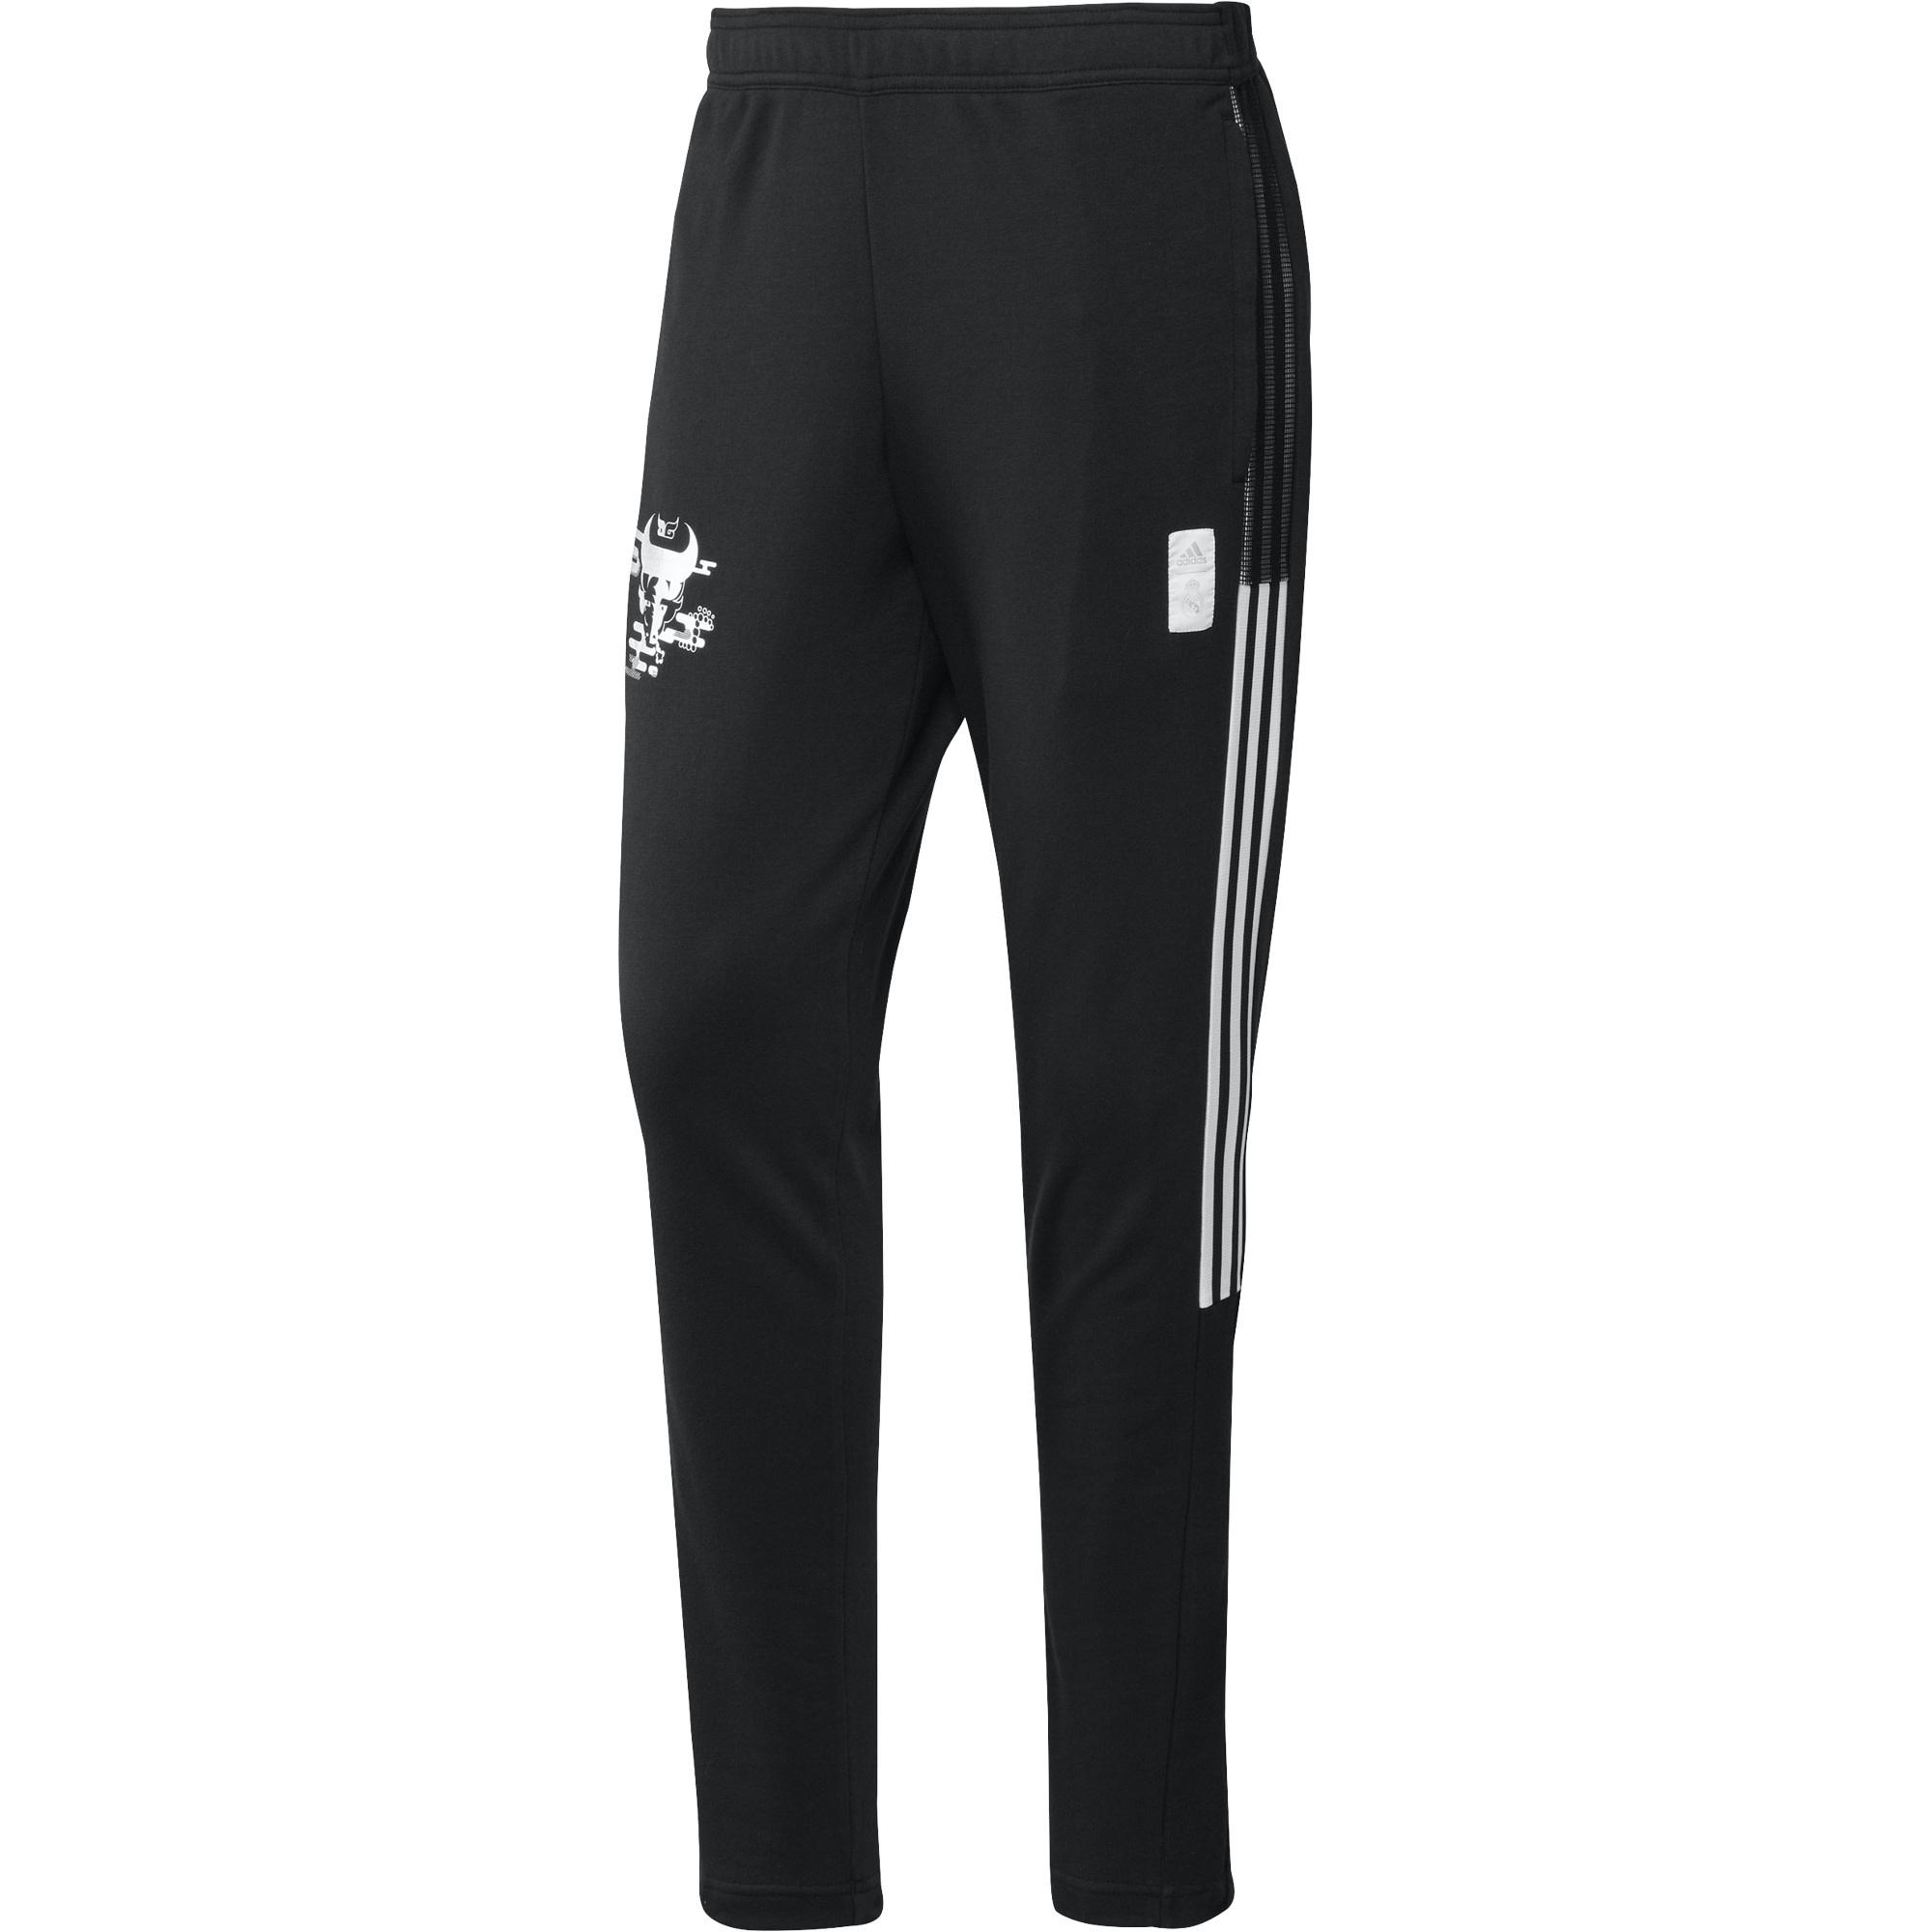 Adidas Real Madrid CNY Pant